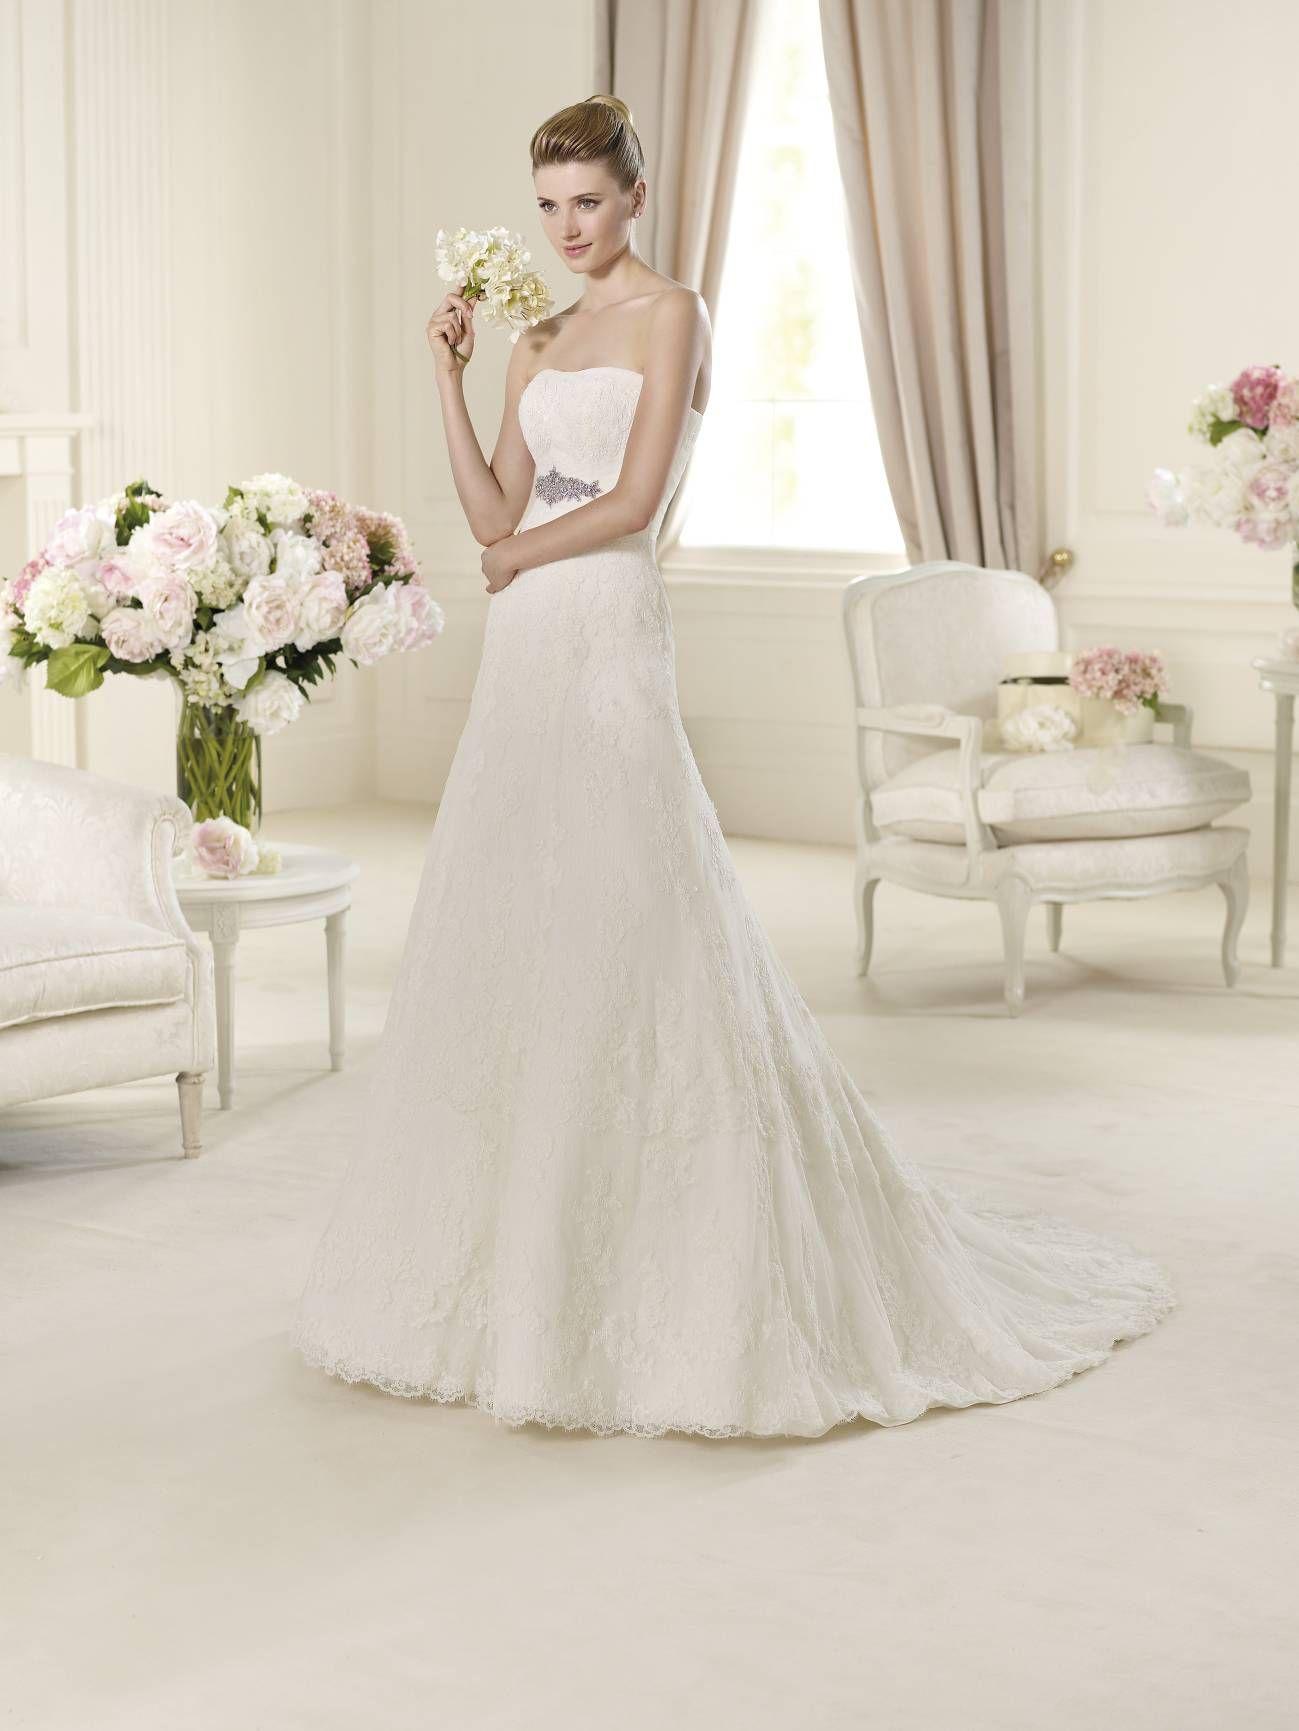 Pronovias Presents The Udine Bridal Dress